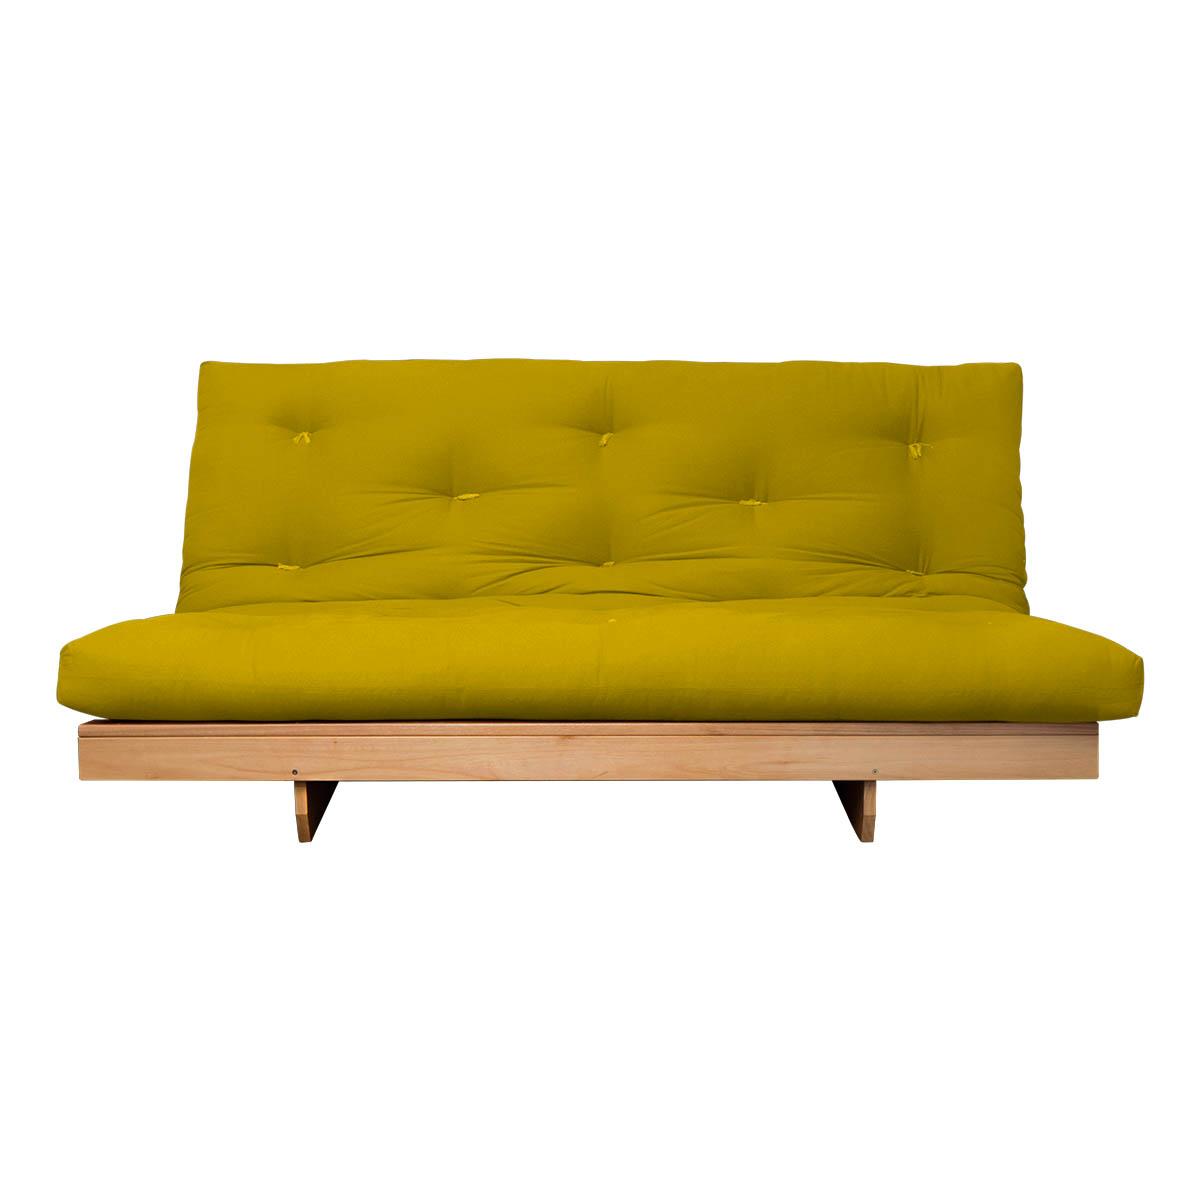 Sofa futon futon company for Futon para sofa cama